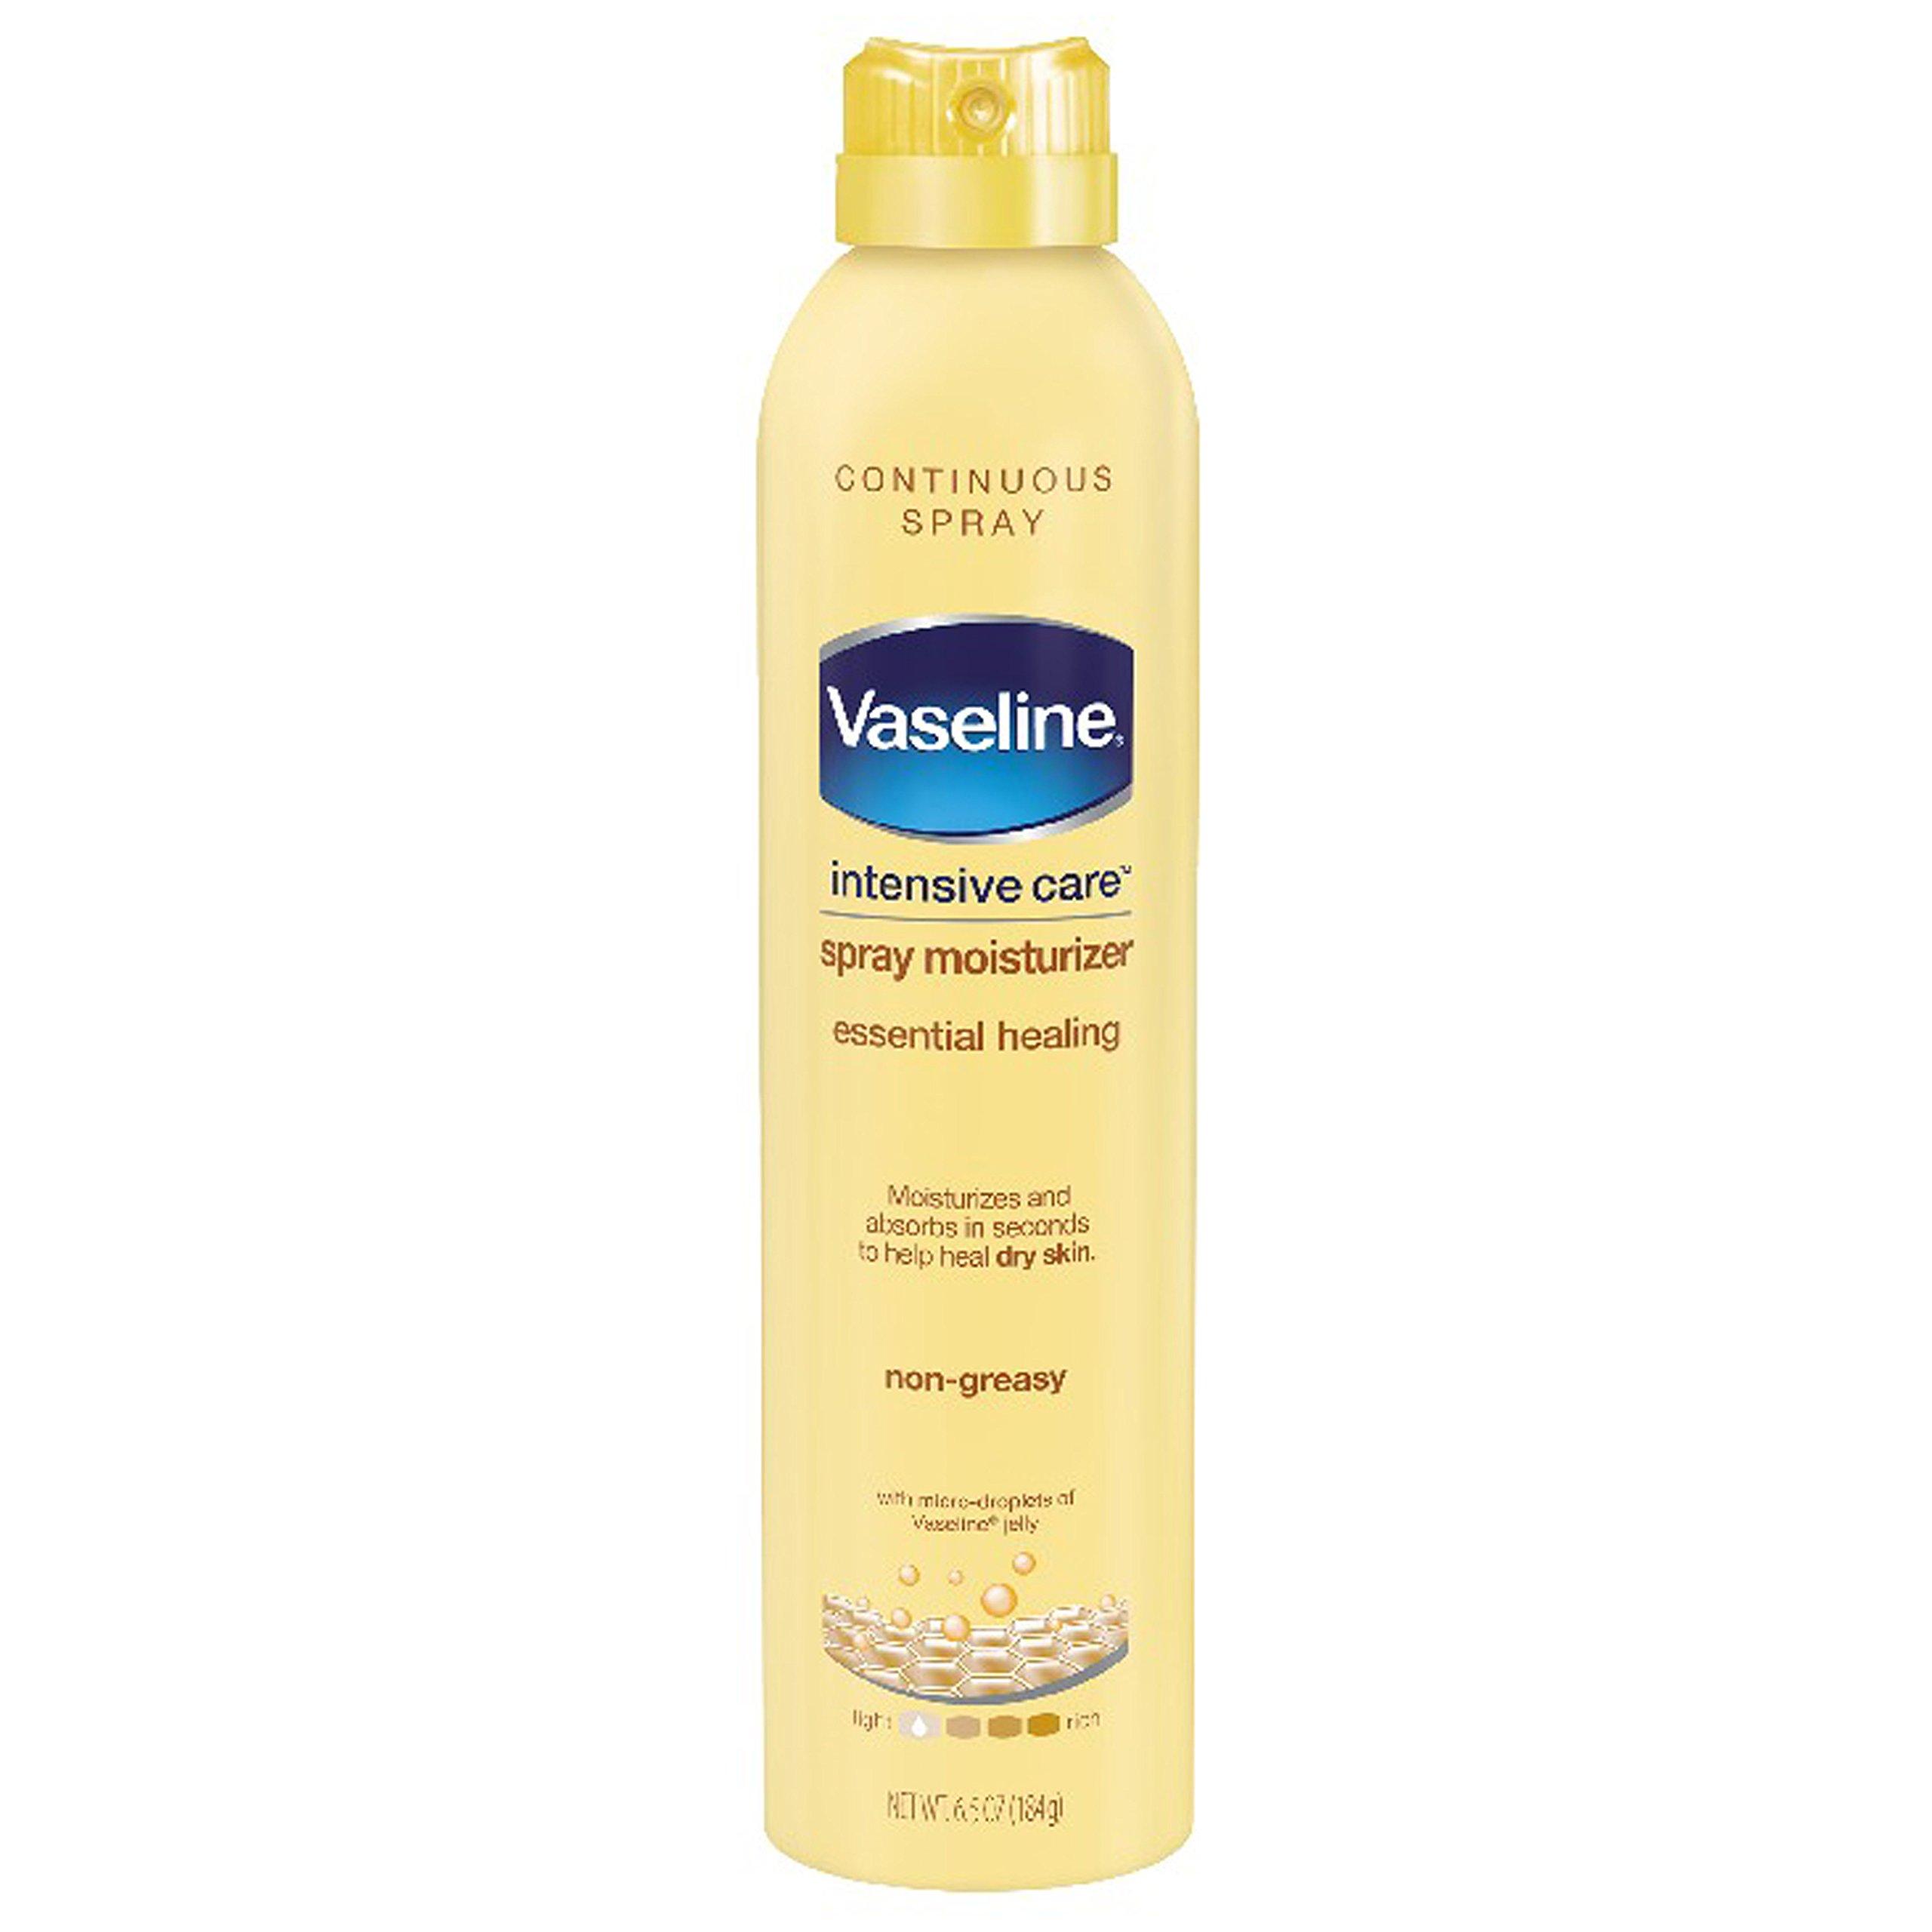 Vaseline Intensive Care Spray Lotion, Essential Healing, 6.5 oz